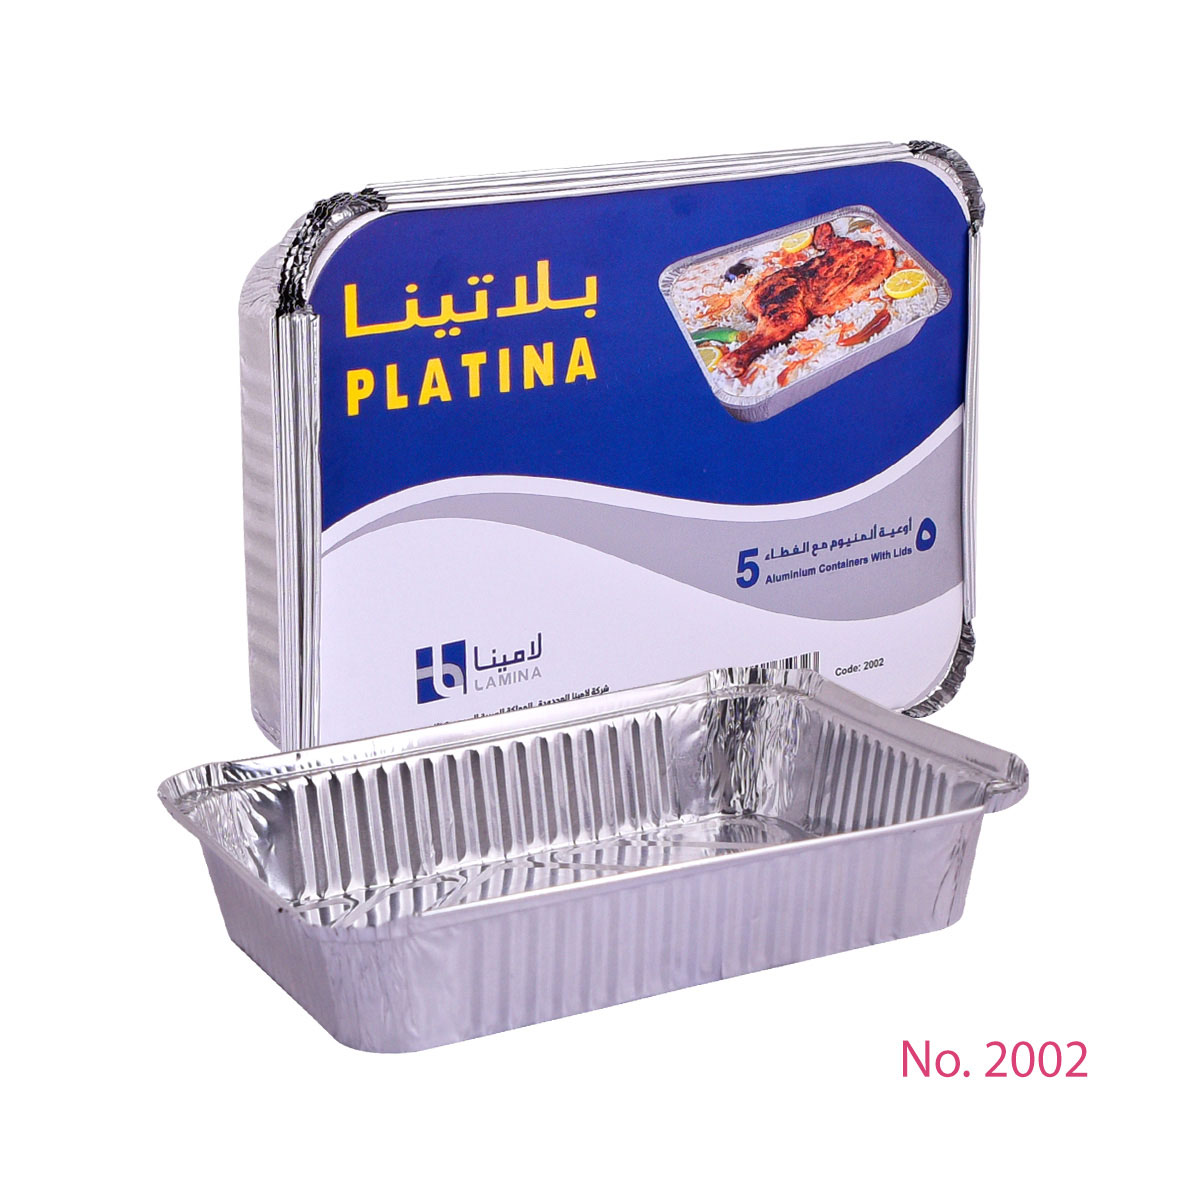 اطباق المنيوم مع الغطاء  - 5 اطباق لامينا - رقم 2002